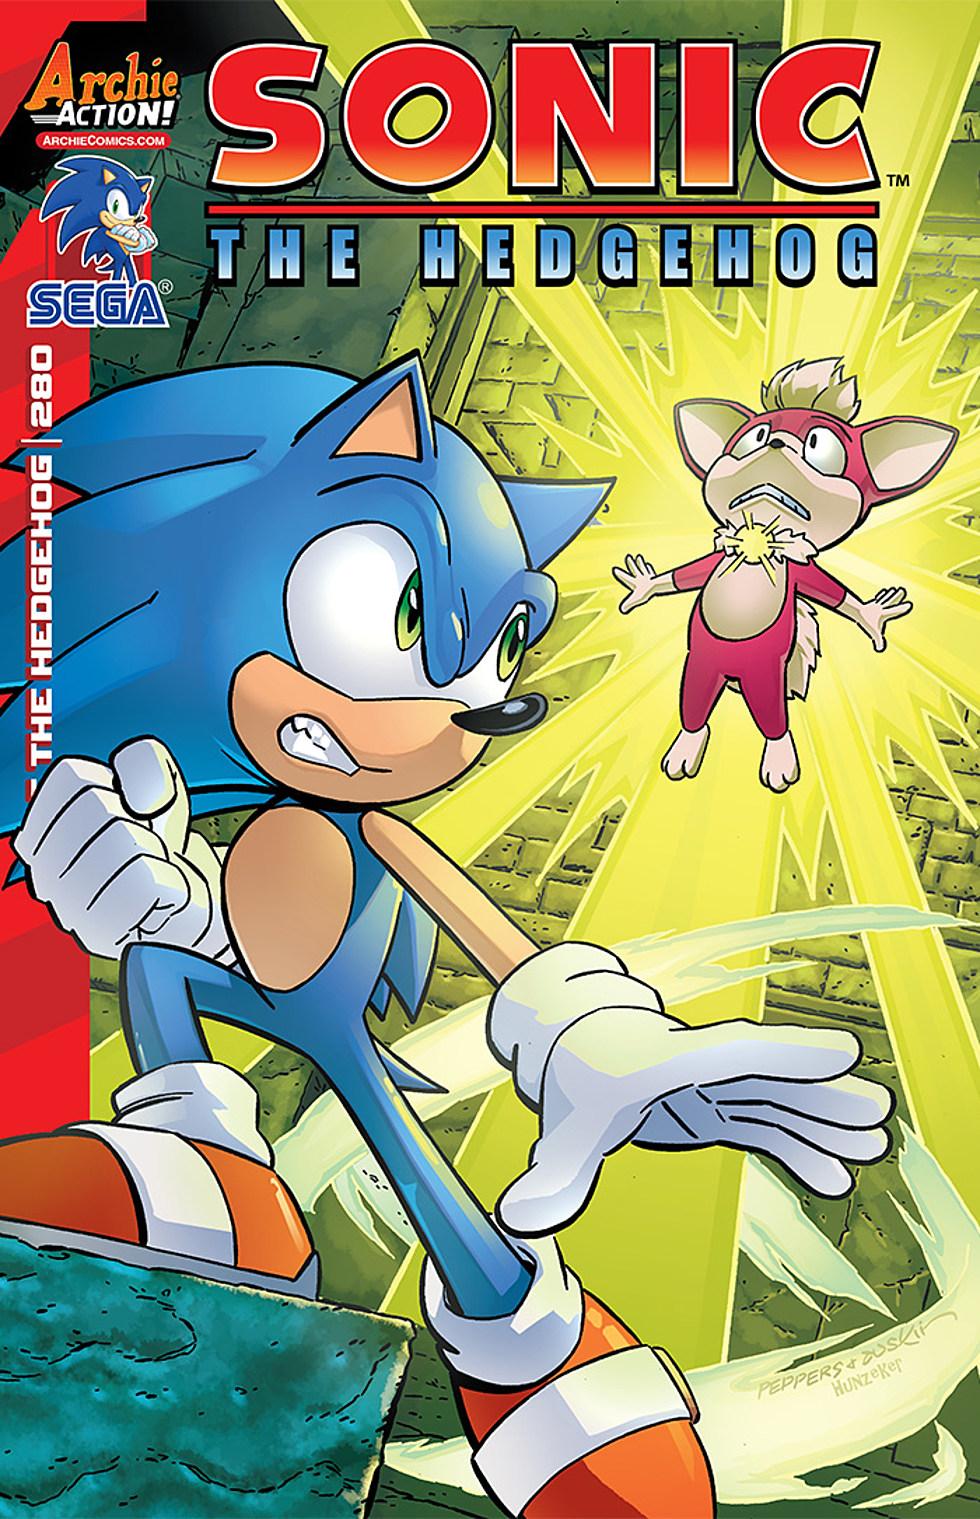 sonic u0027s world tour continues in u0027sonic the hedgehog u0027 280